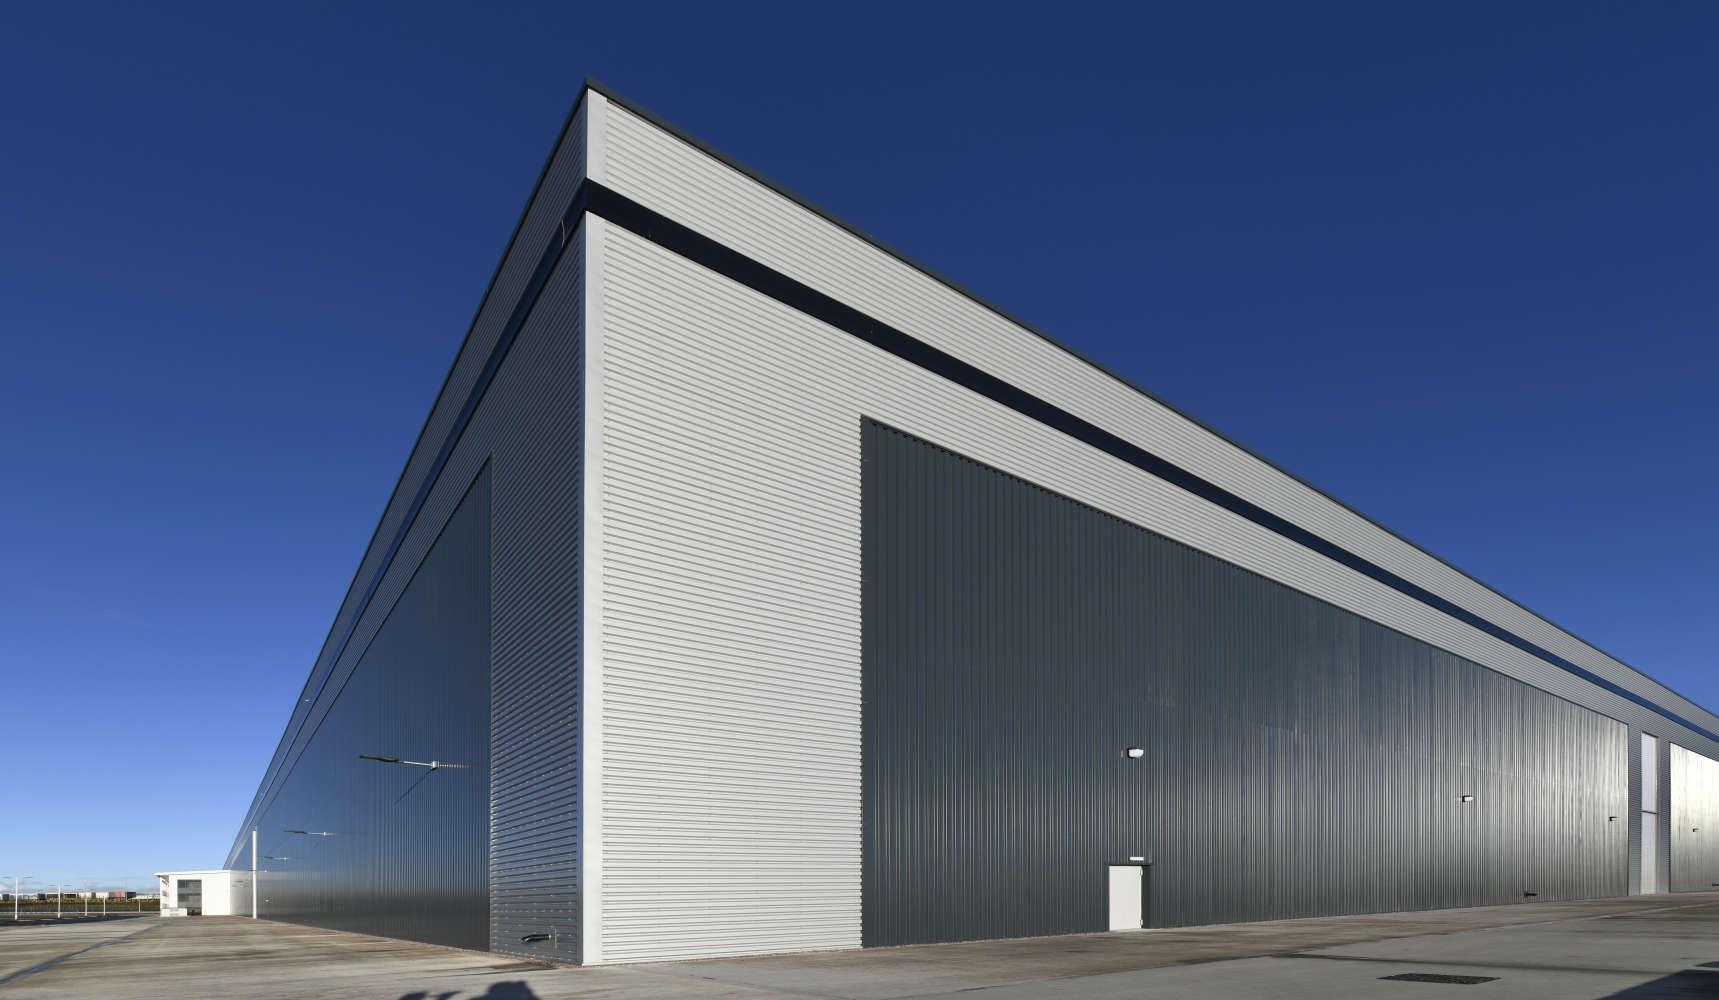 Industrial Bolton, BL5 1DB - 375 at Logistics North - 6111